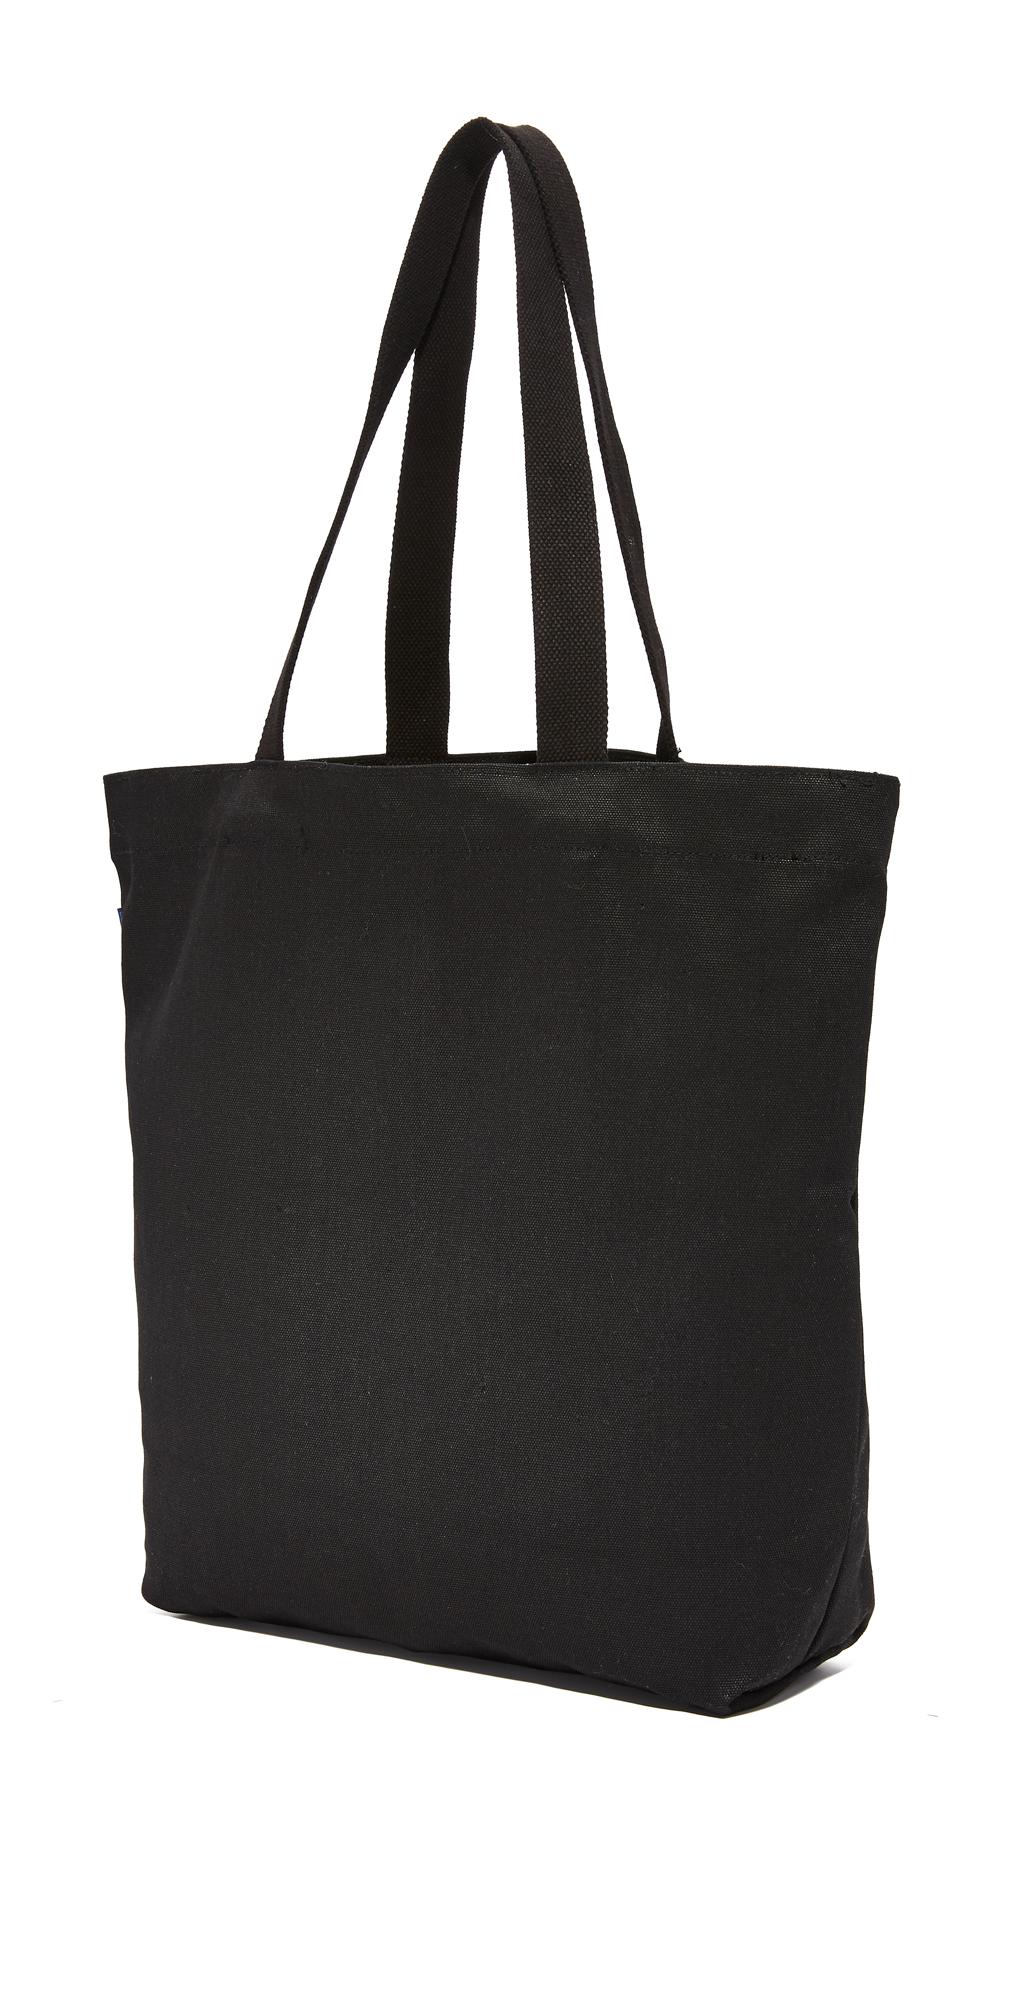 BAGGU Canvas Shopper Tote | SHOPBOP